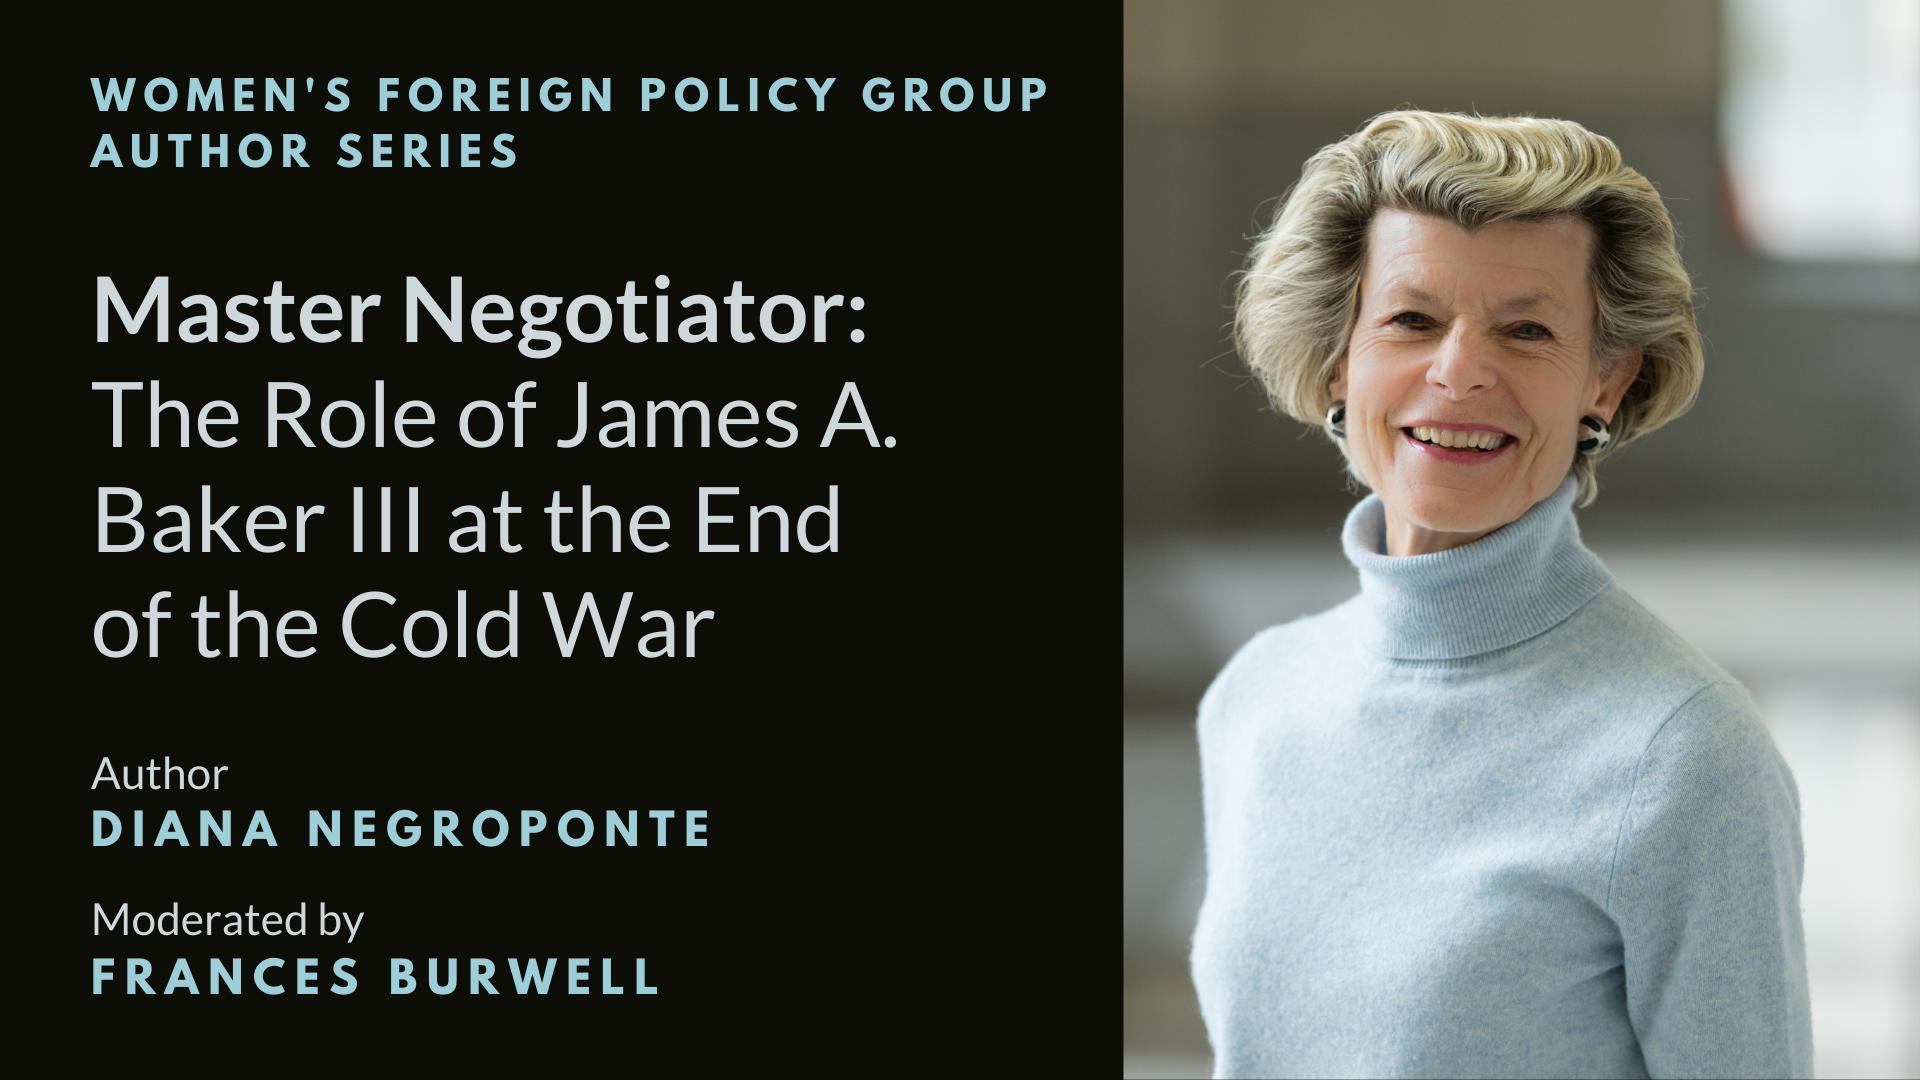 Negroponte Master Negotiator